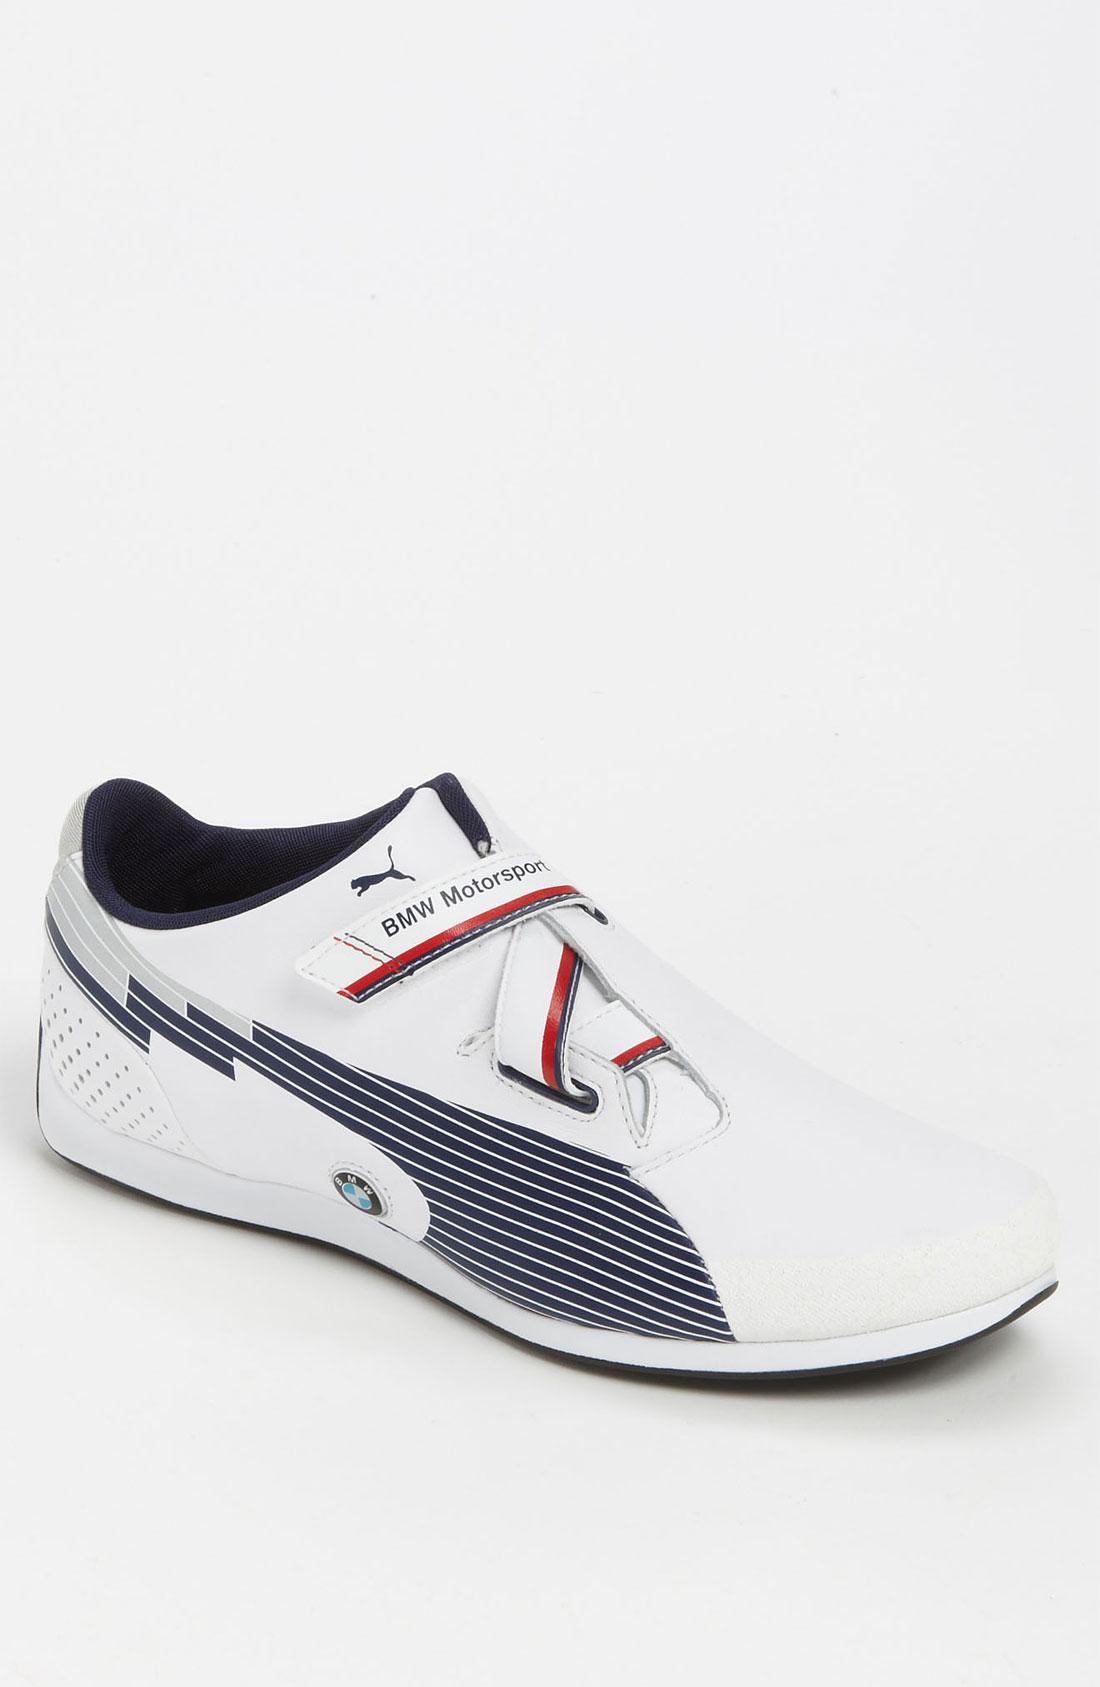 puma evo speed f1 bmw sneaker in white for men white. Black Bedroom Furniture Sets. Home Design Ideas